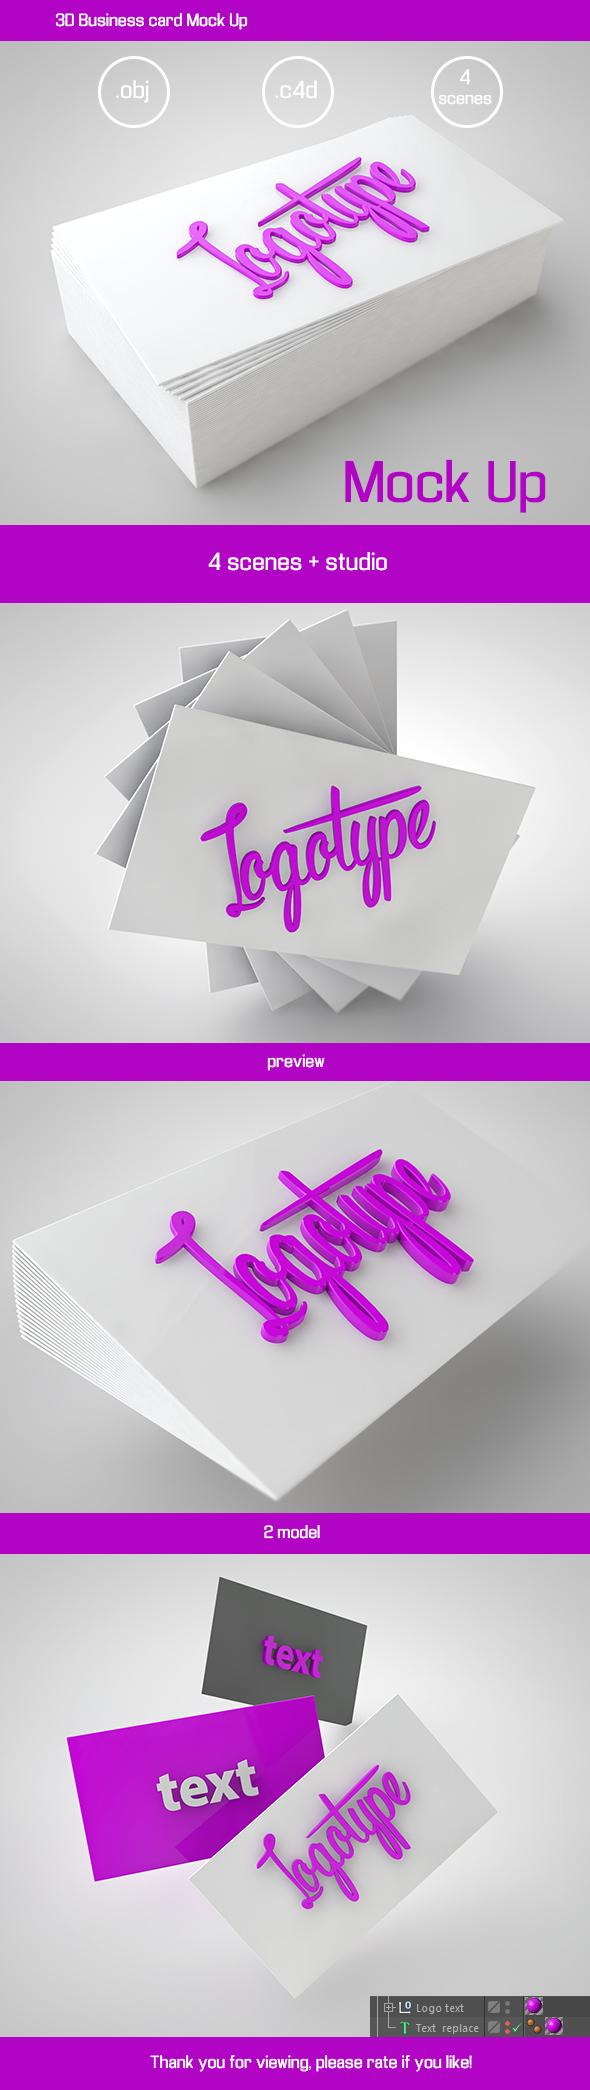 3D Business card Mock Up - 3DOcean Item for Sale